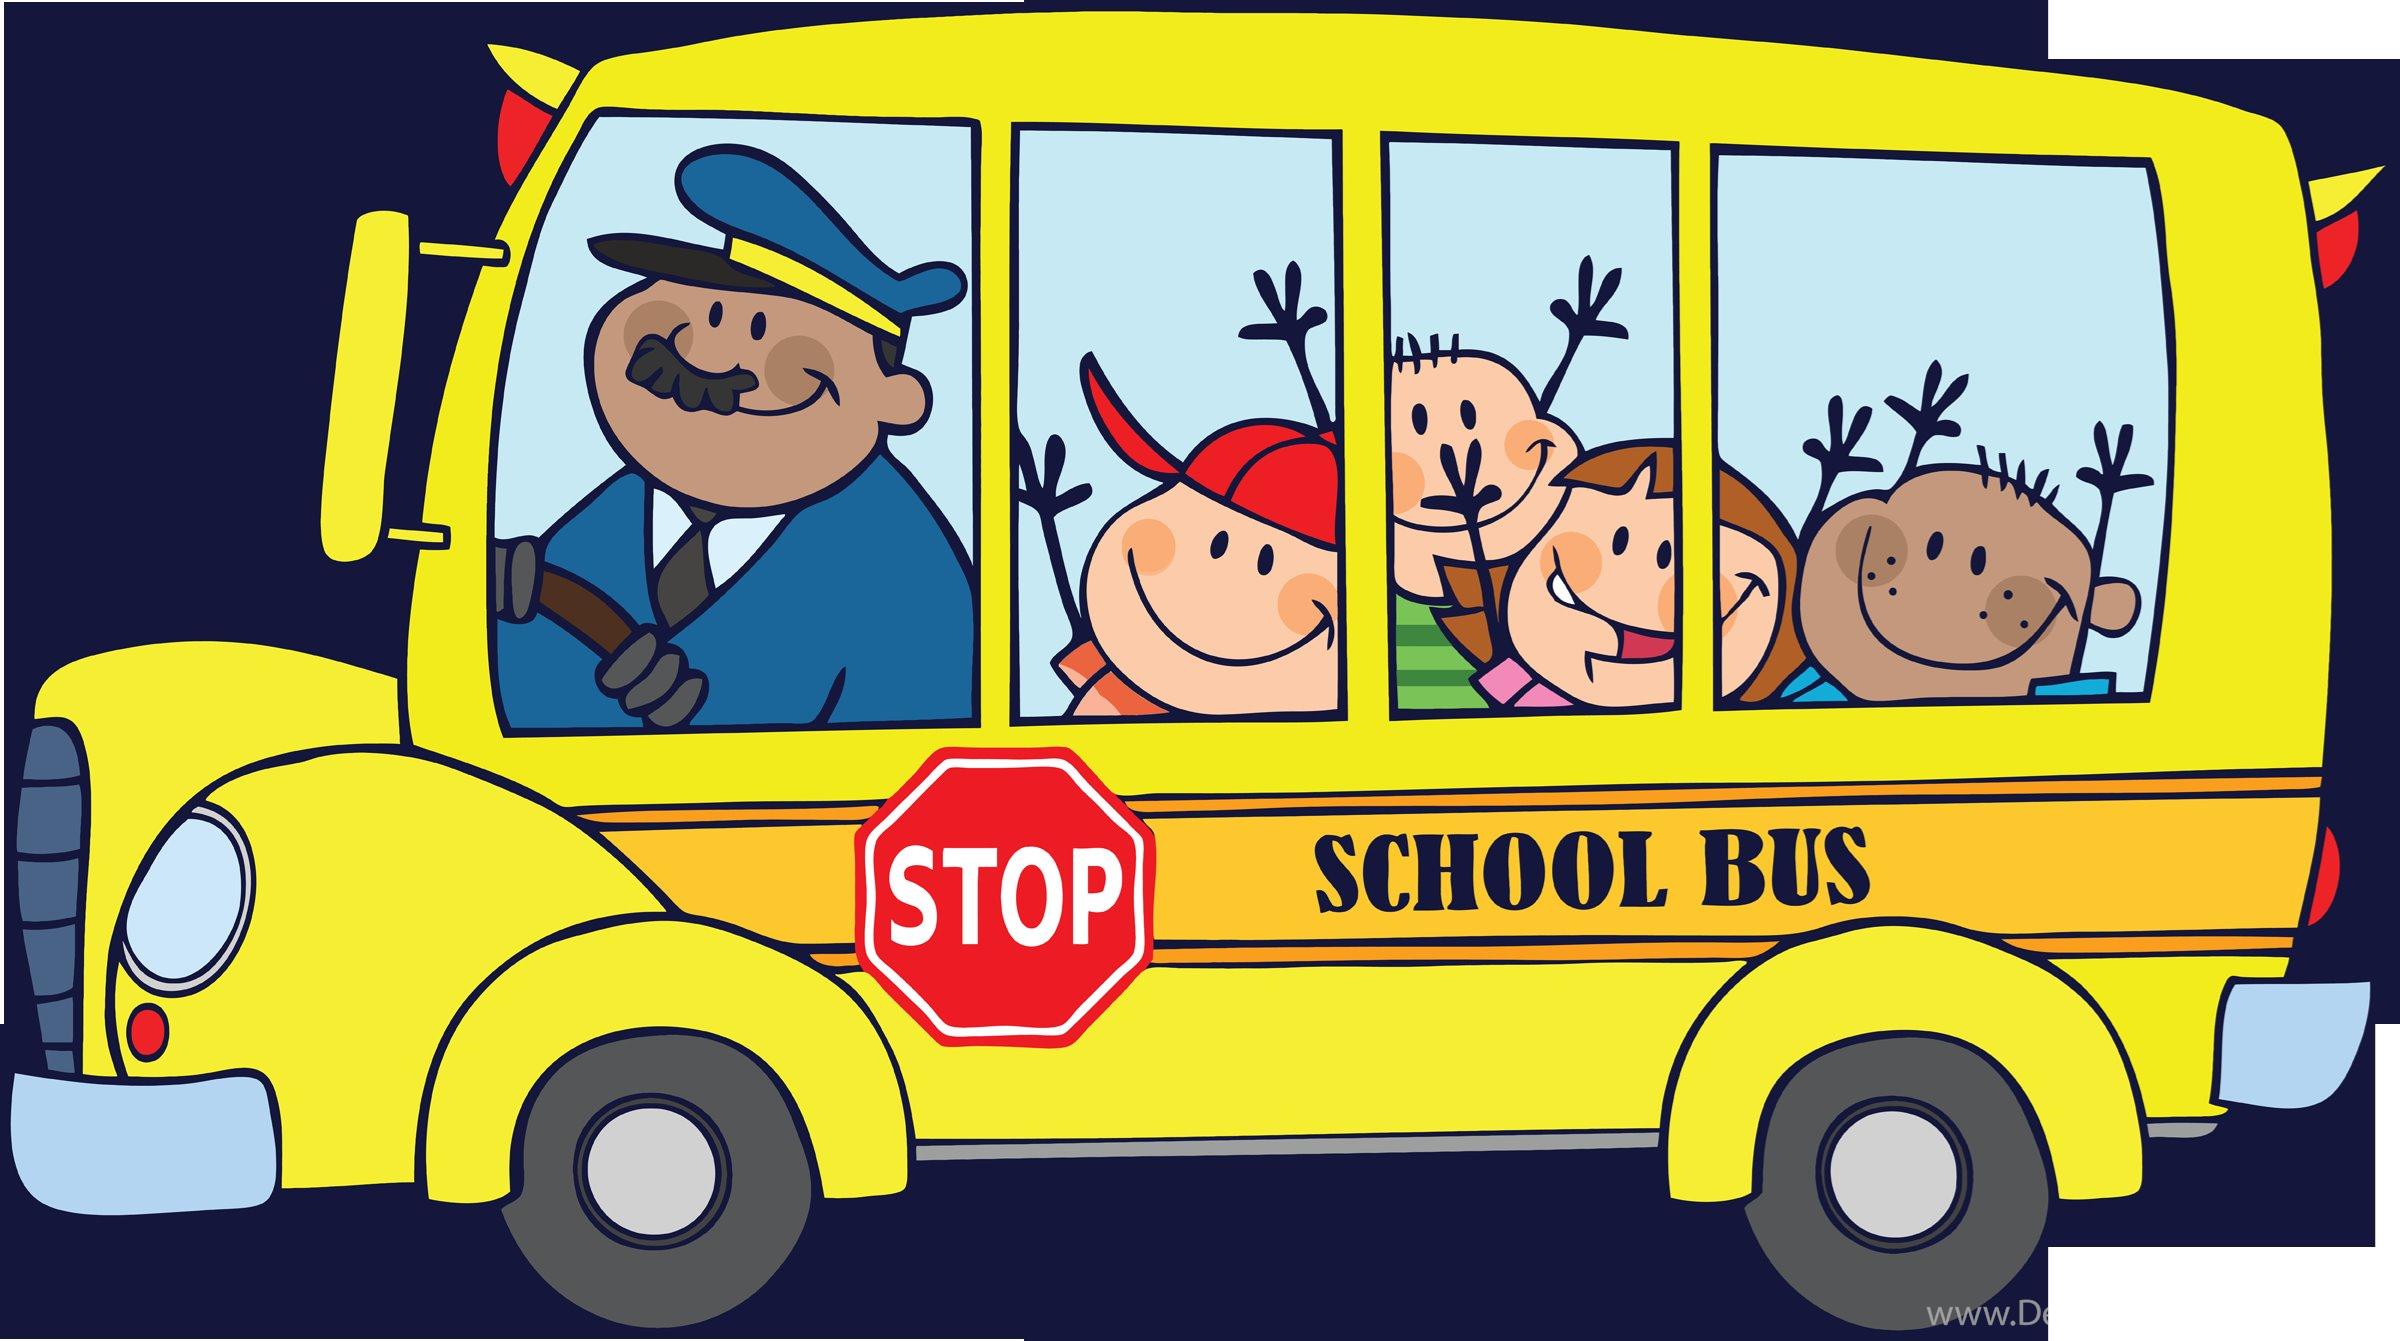 school bus wallpapers hd - photo #33